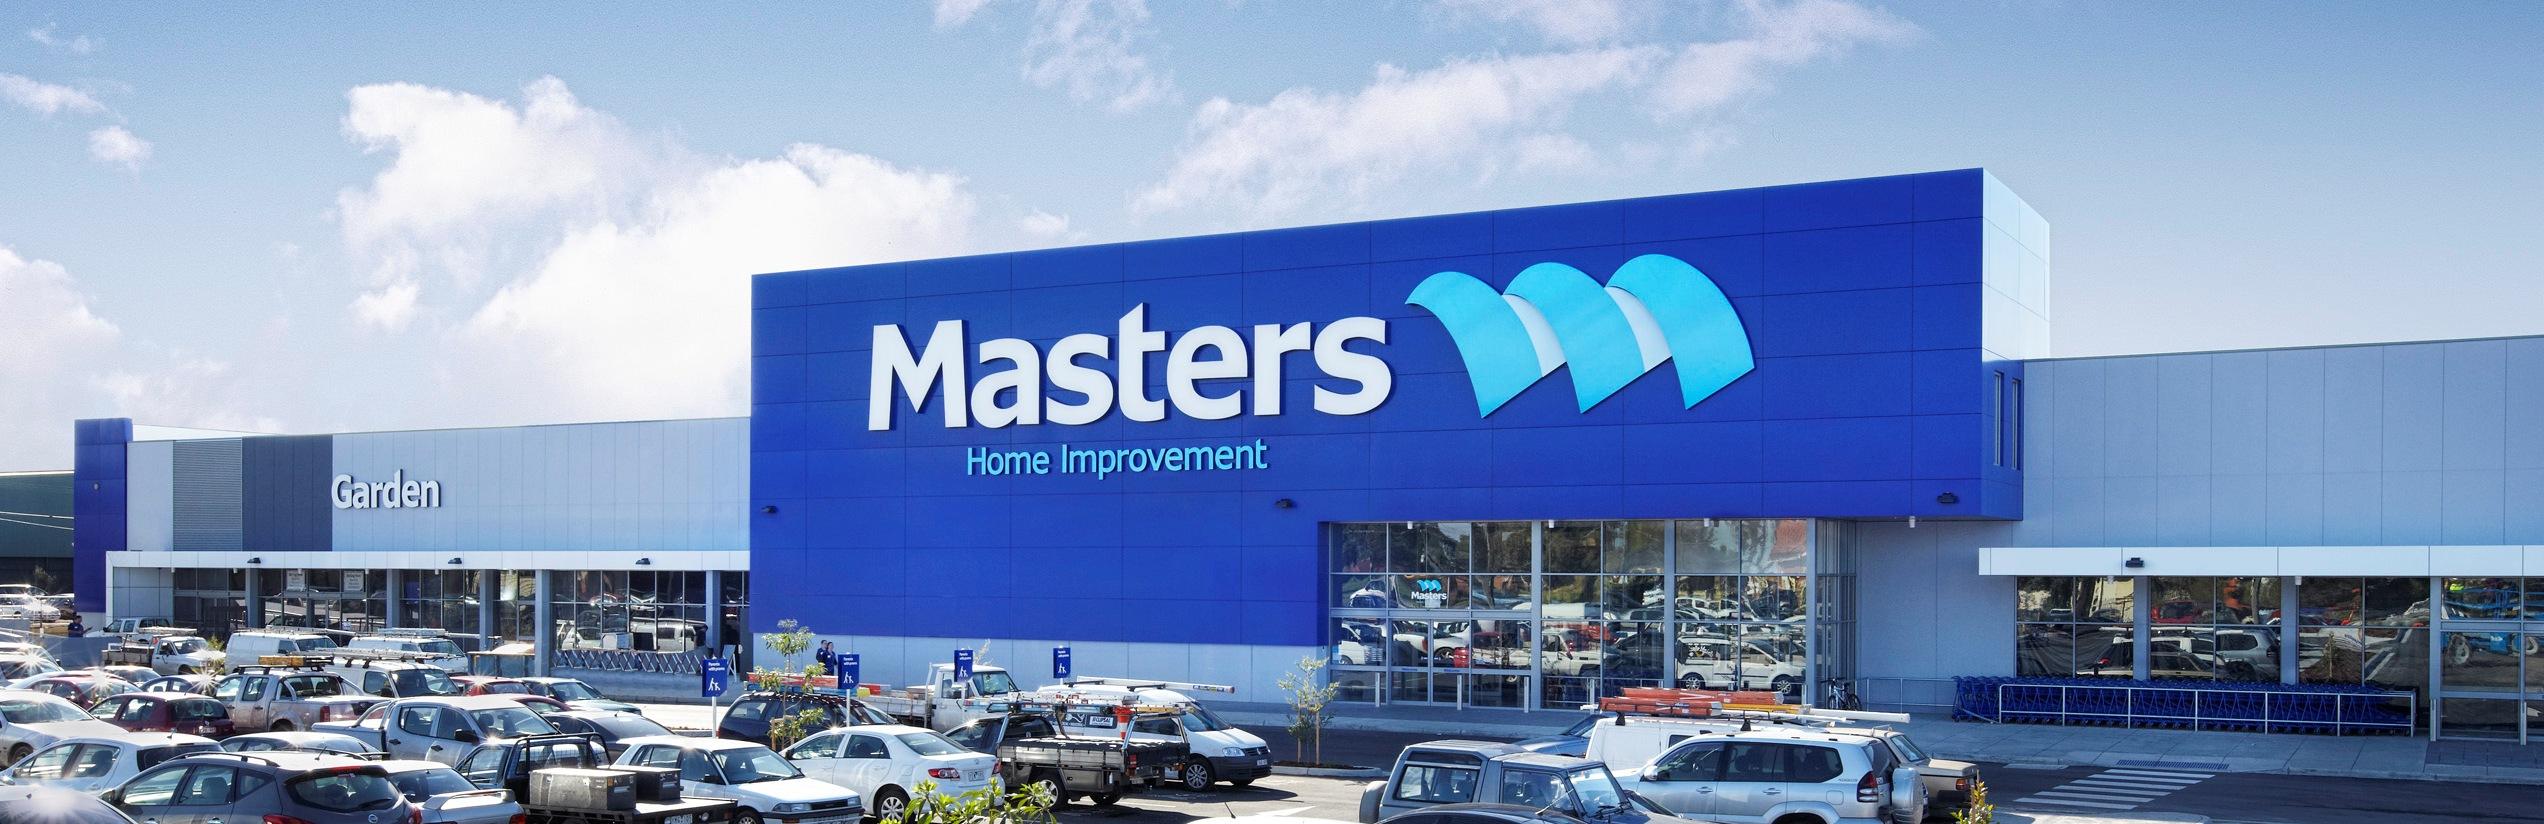 masters home improvement